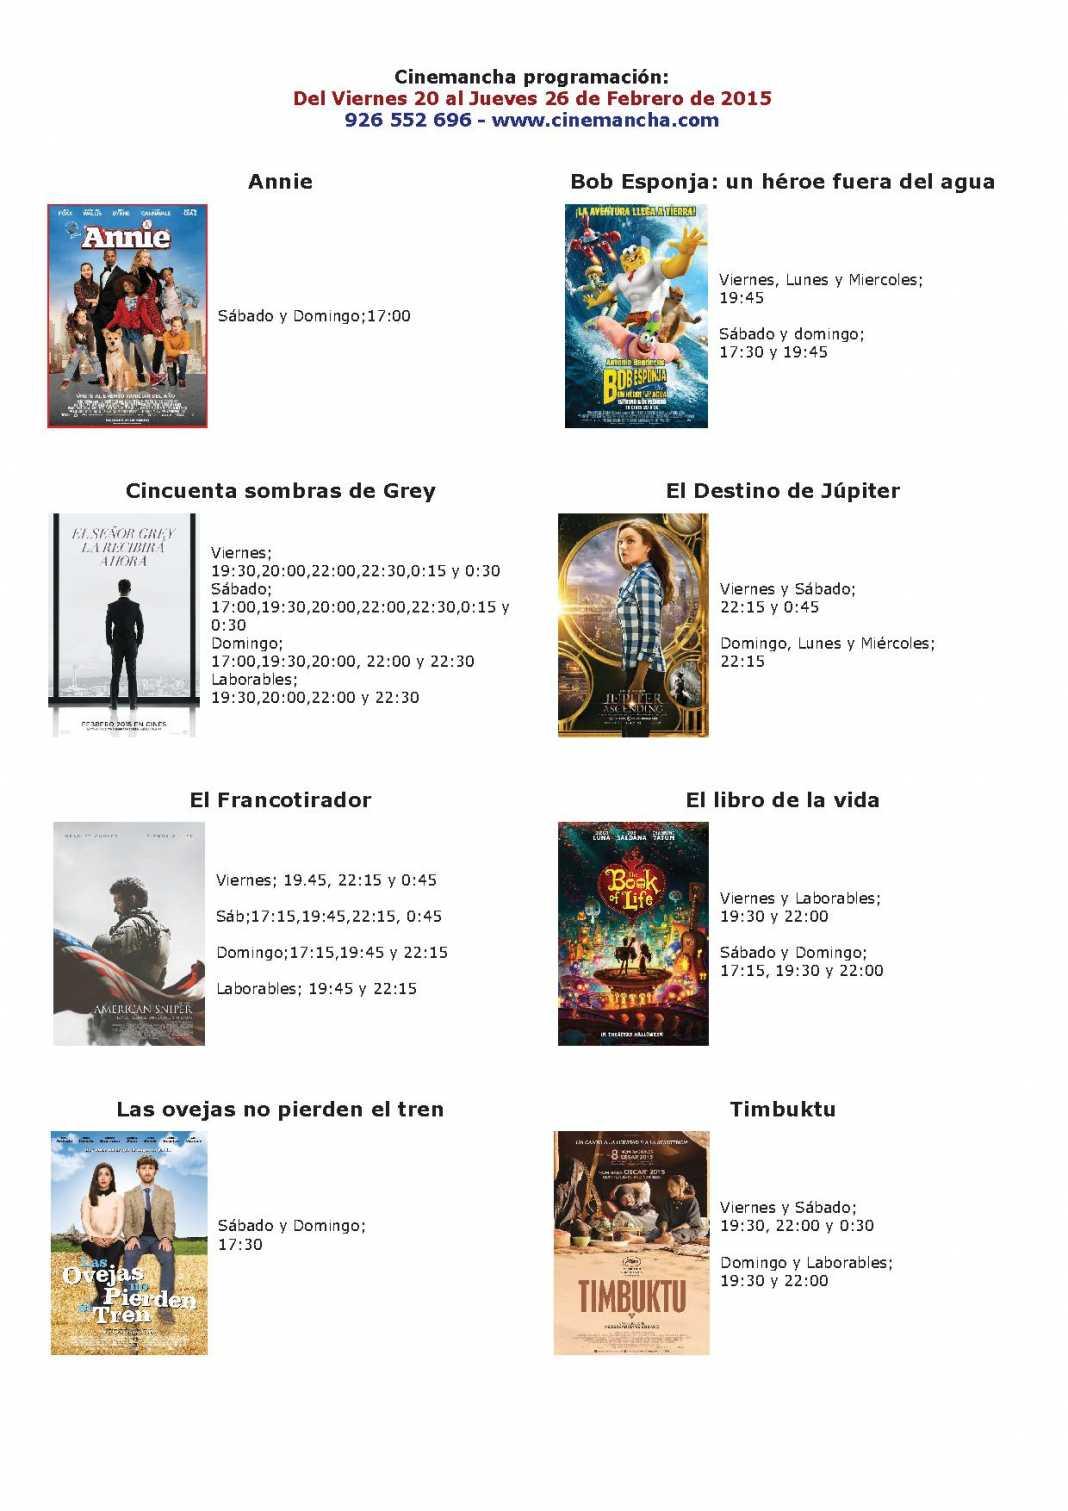 Cartelera de Cinemancha del 20 al 26 de febrero 1